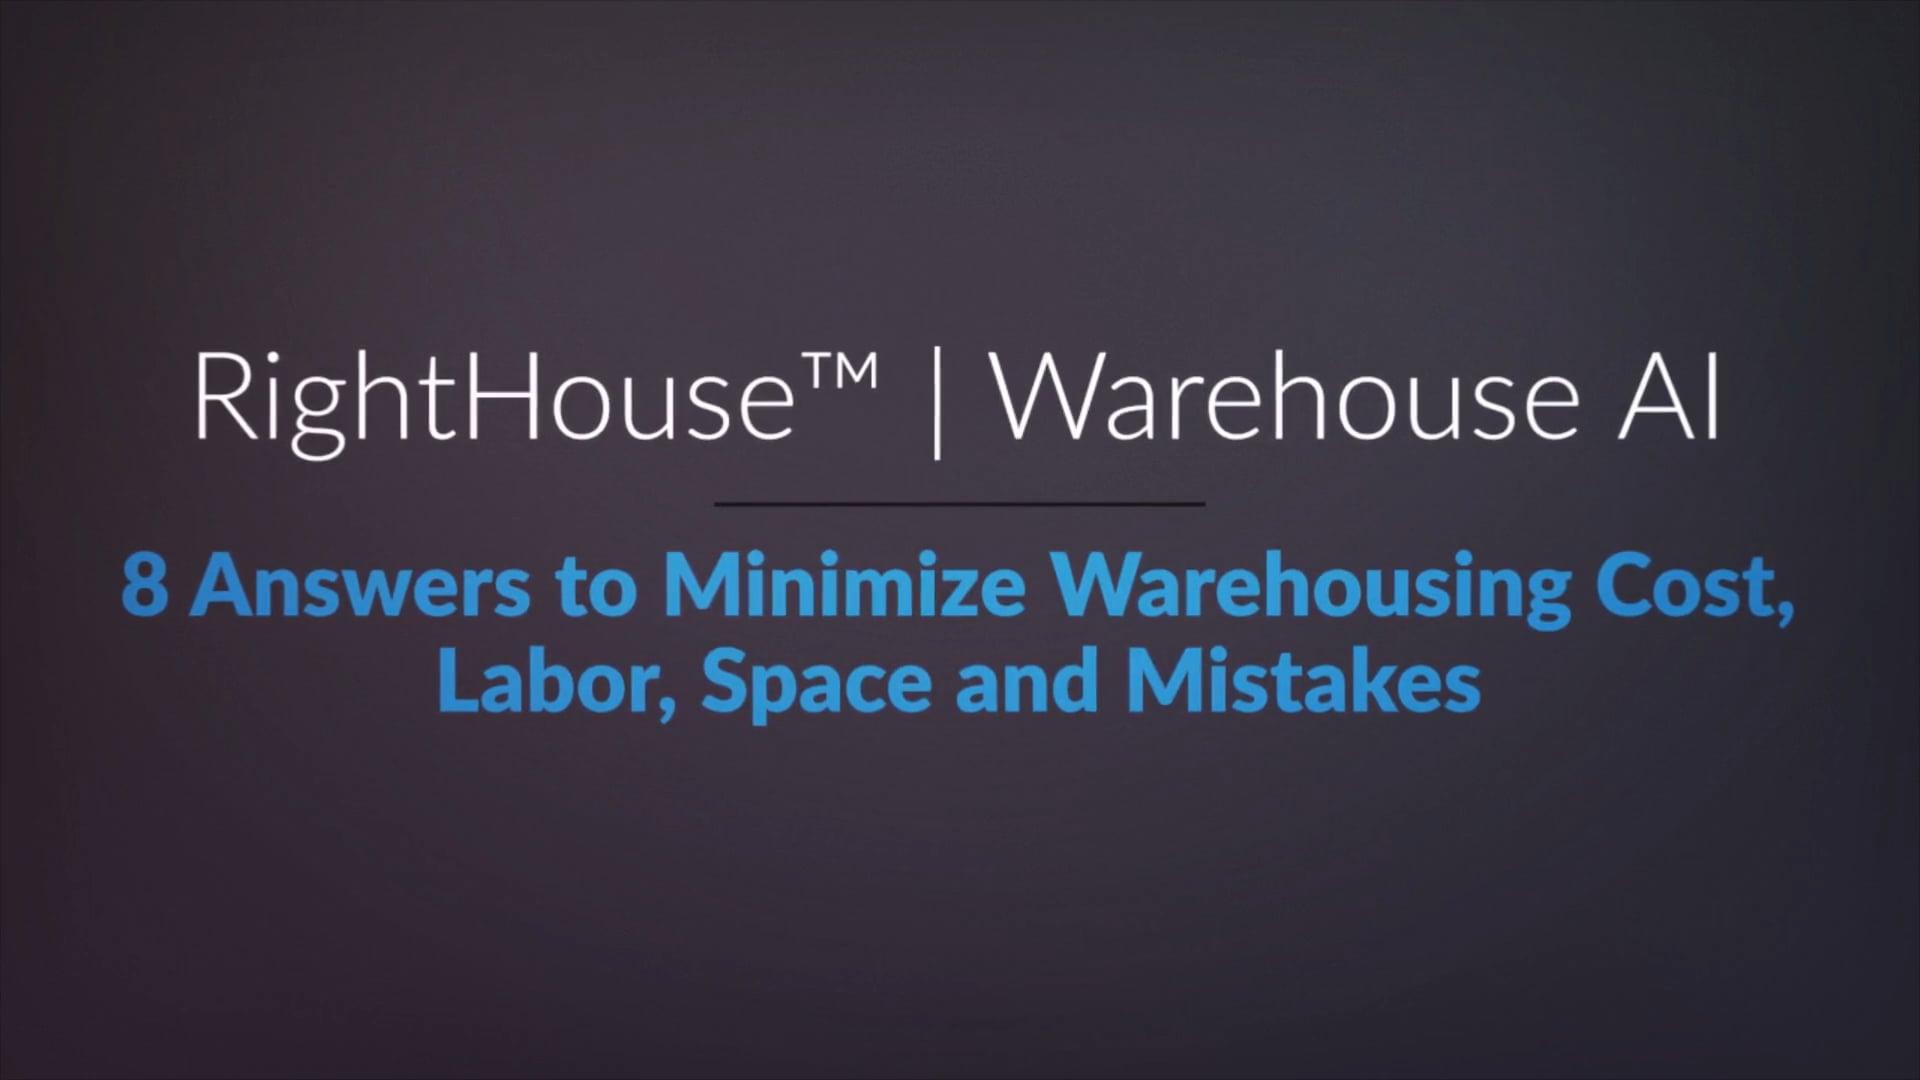 RightHouse | Warehouse AI